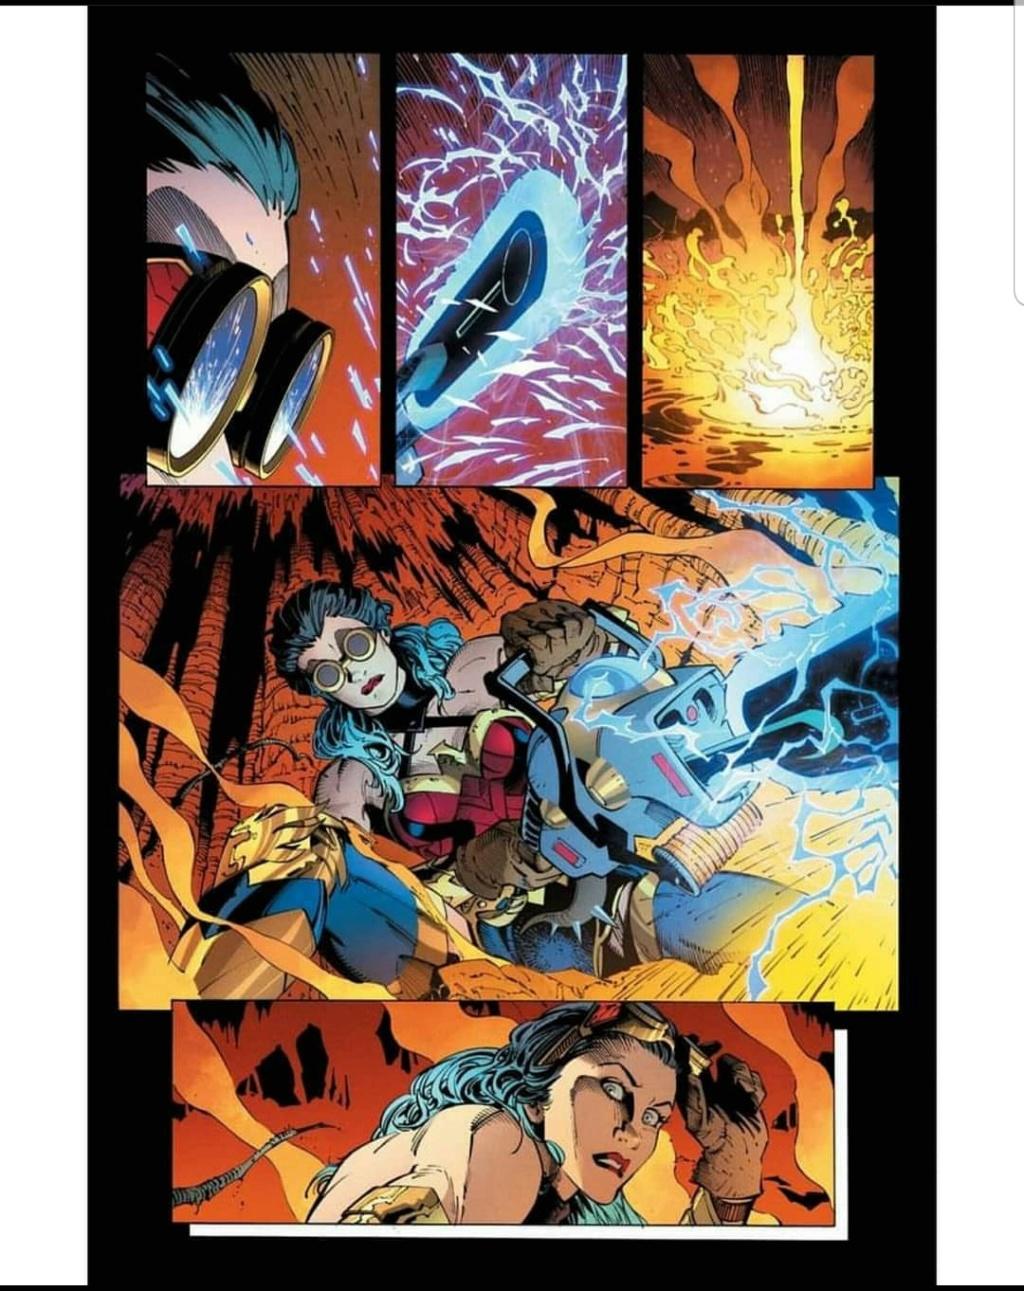 [DC COMICS] Publicaciones Universo DC: Discusión General v2 - Página 16 20200314